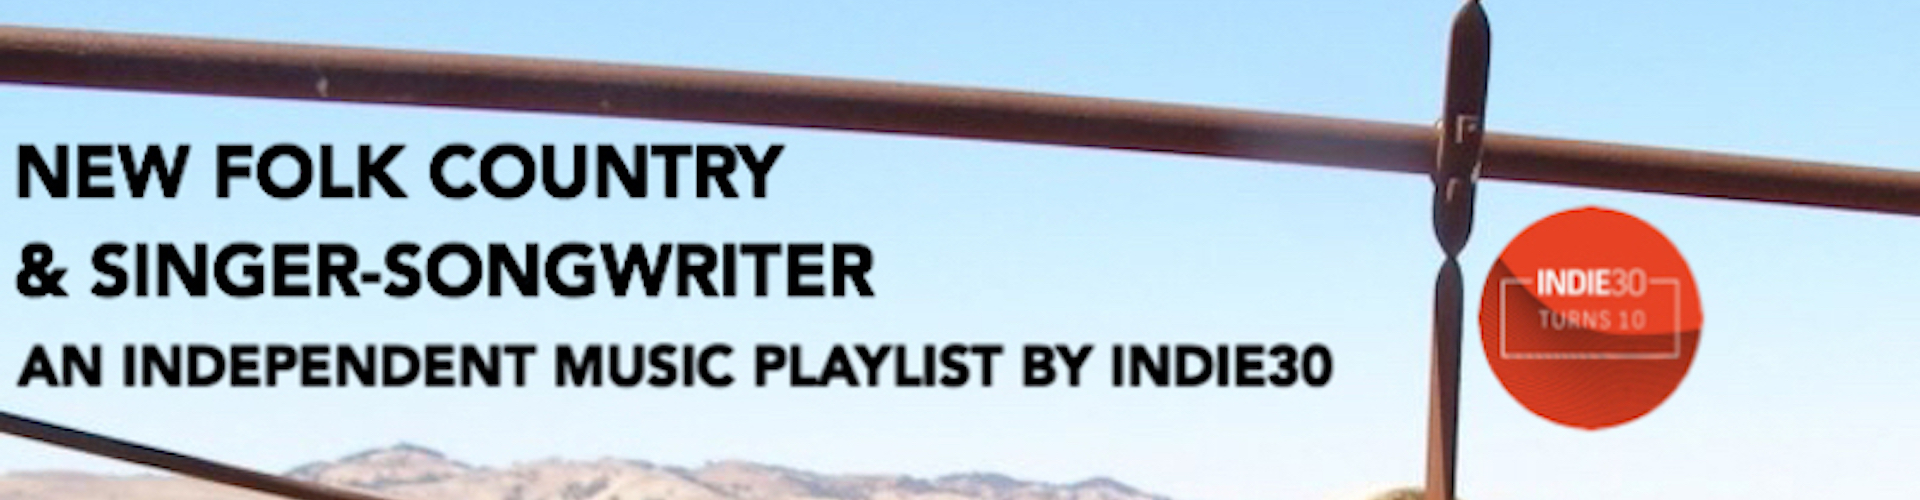 New-Folk-Country-Singer-Songwriter-Widget